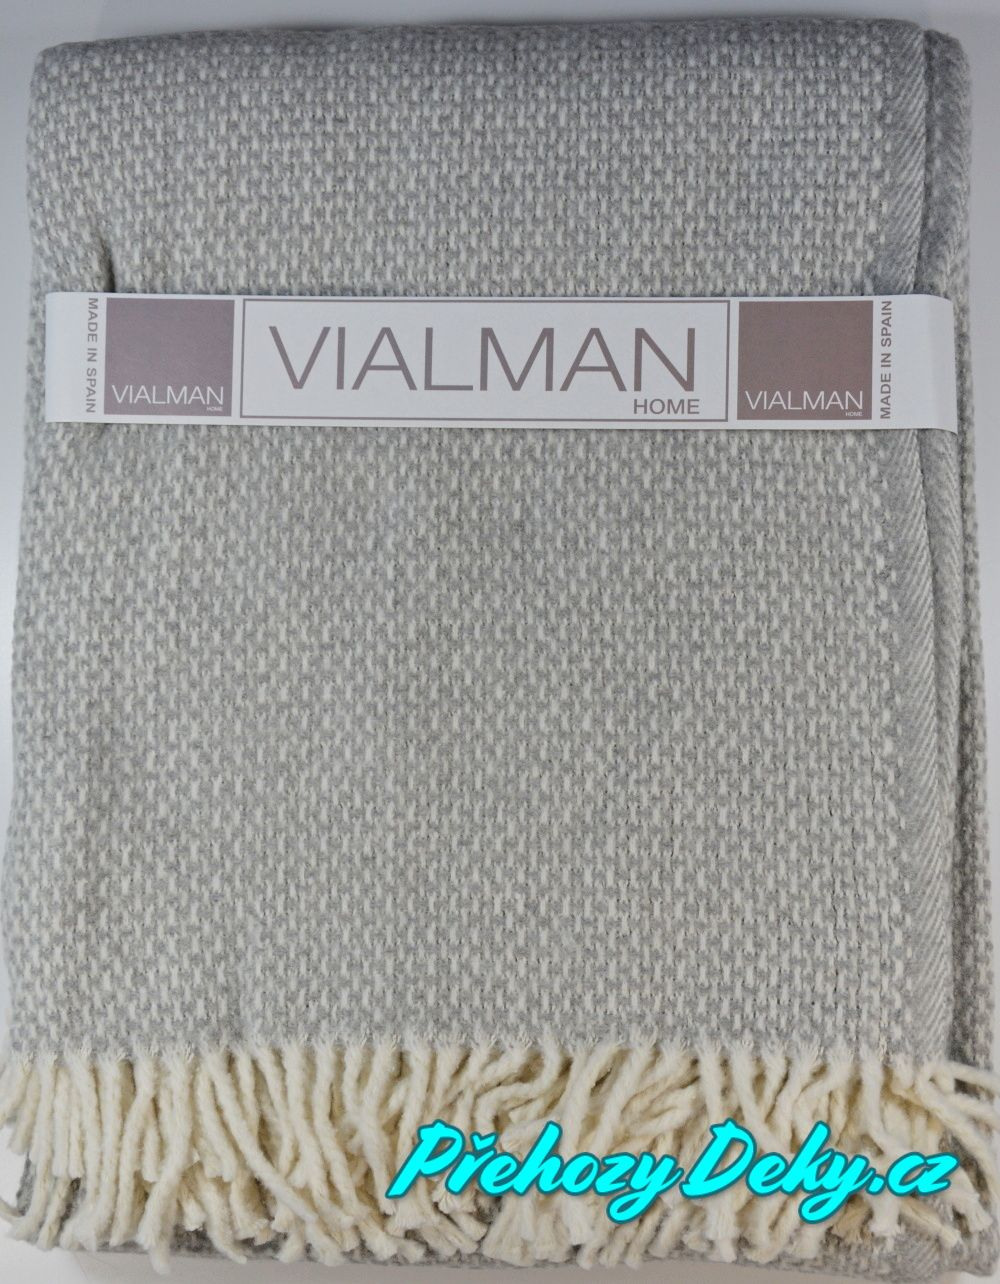 Vialman pletený pléd s třásněmi, plédy na postel, společenské plédy